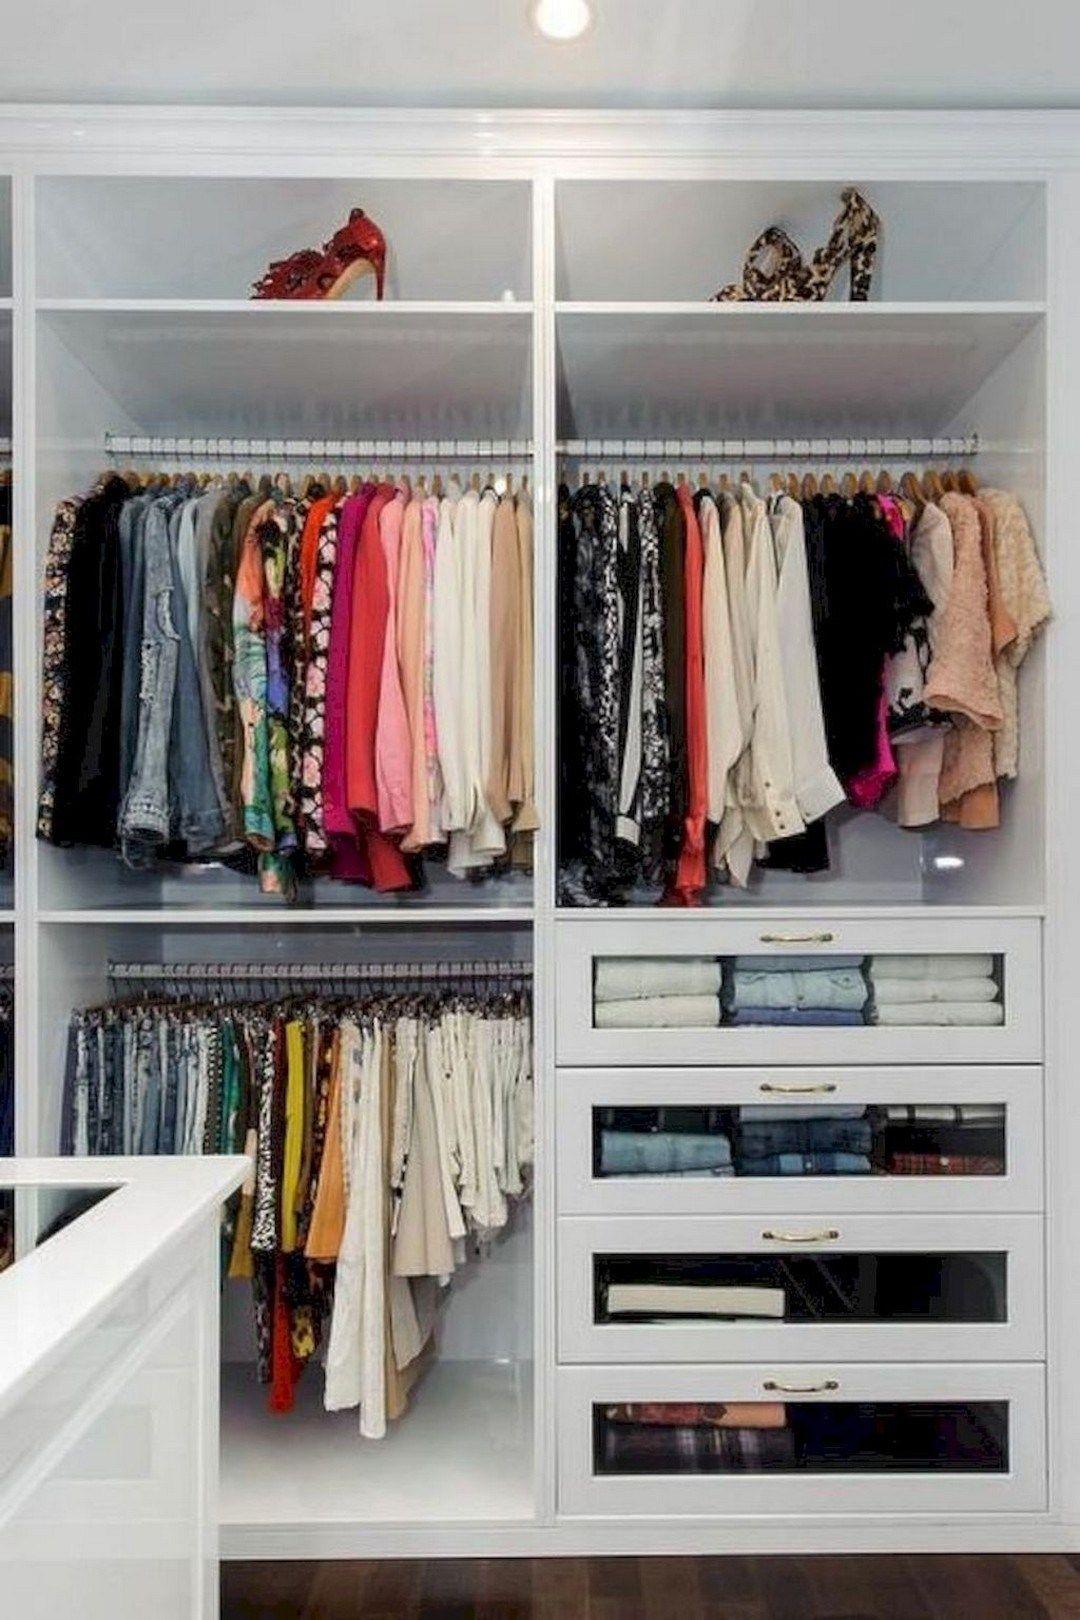 32 Smart Storage Ideas To Improve Closet Organization And Maximize Small Spaces Alladecor Com Small Closet Storage Closet Storage Closet Bedroom